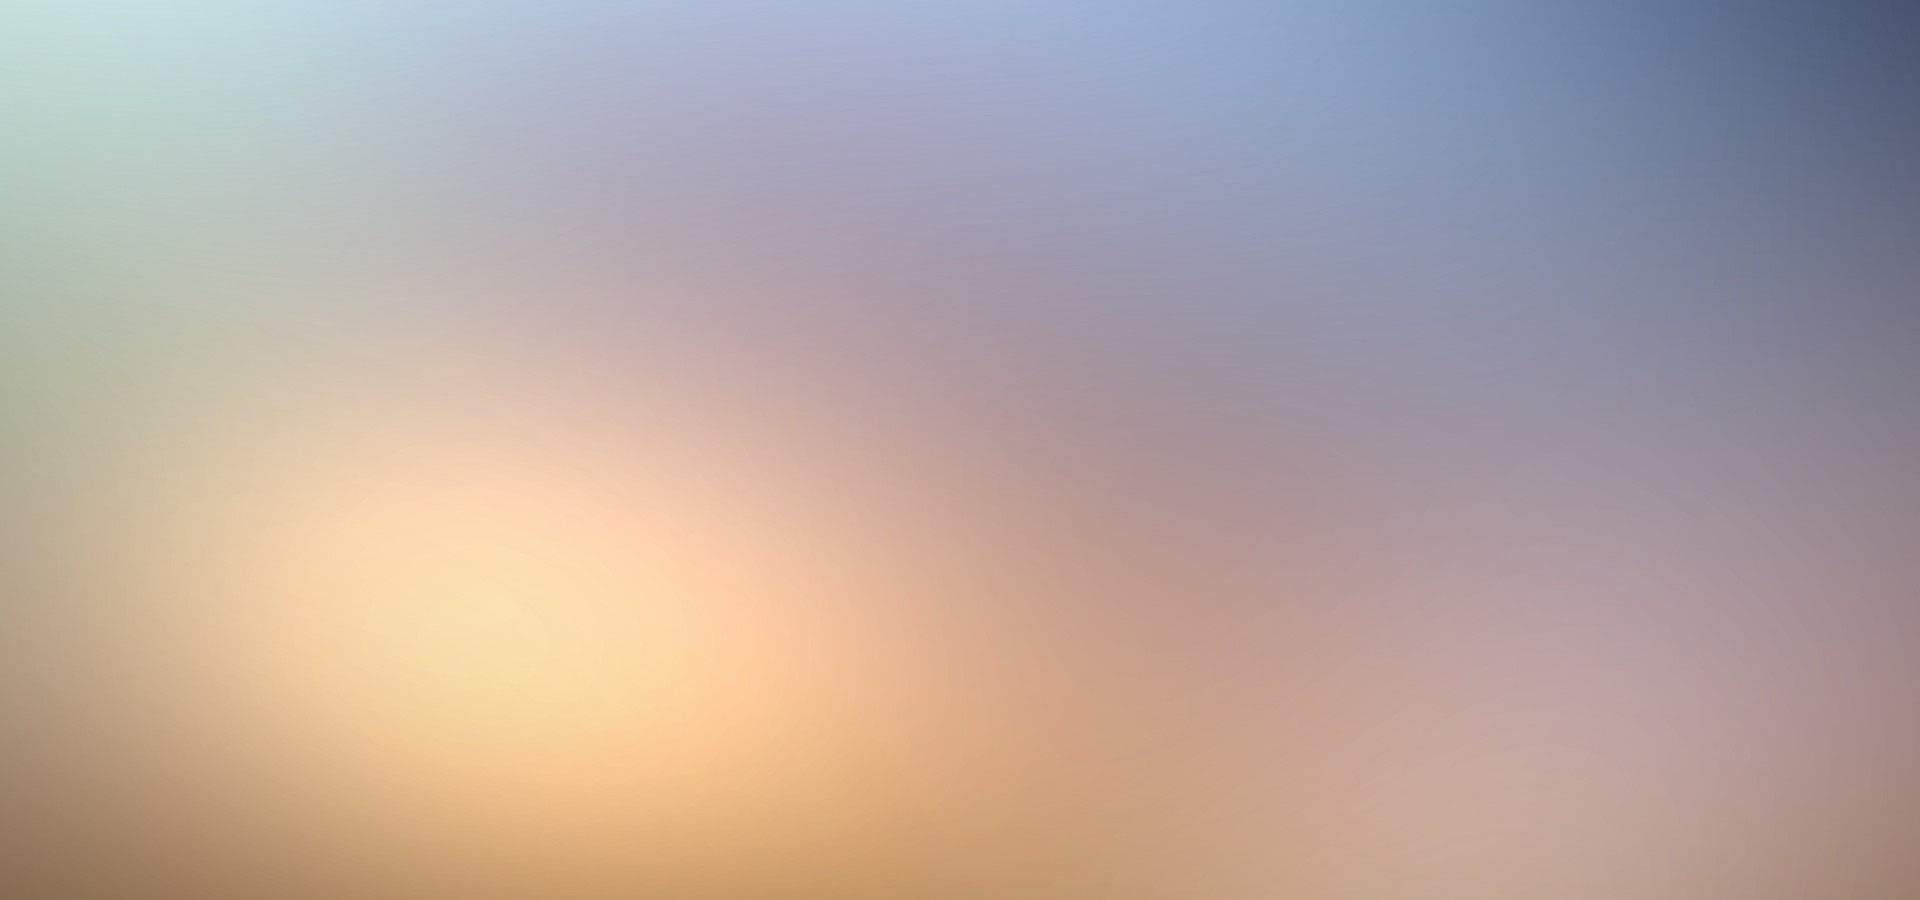 Ipromo Array image140